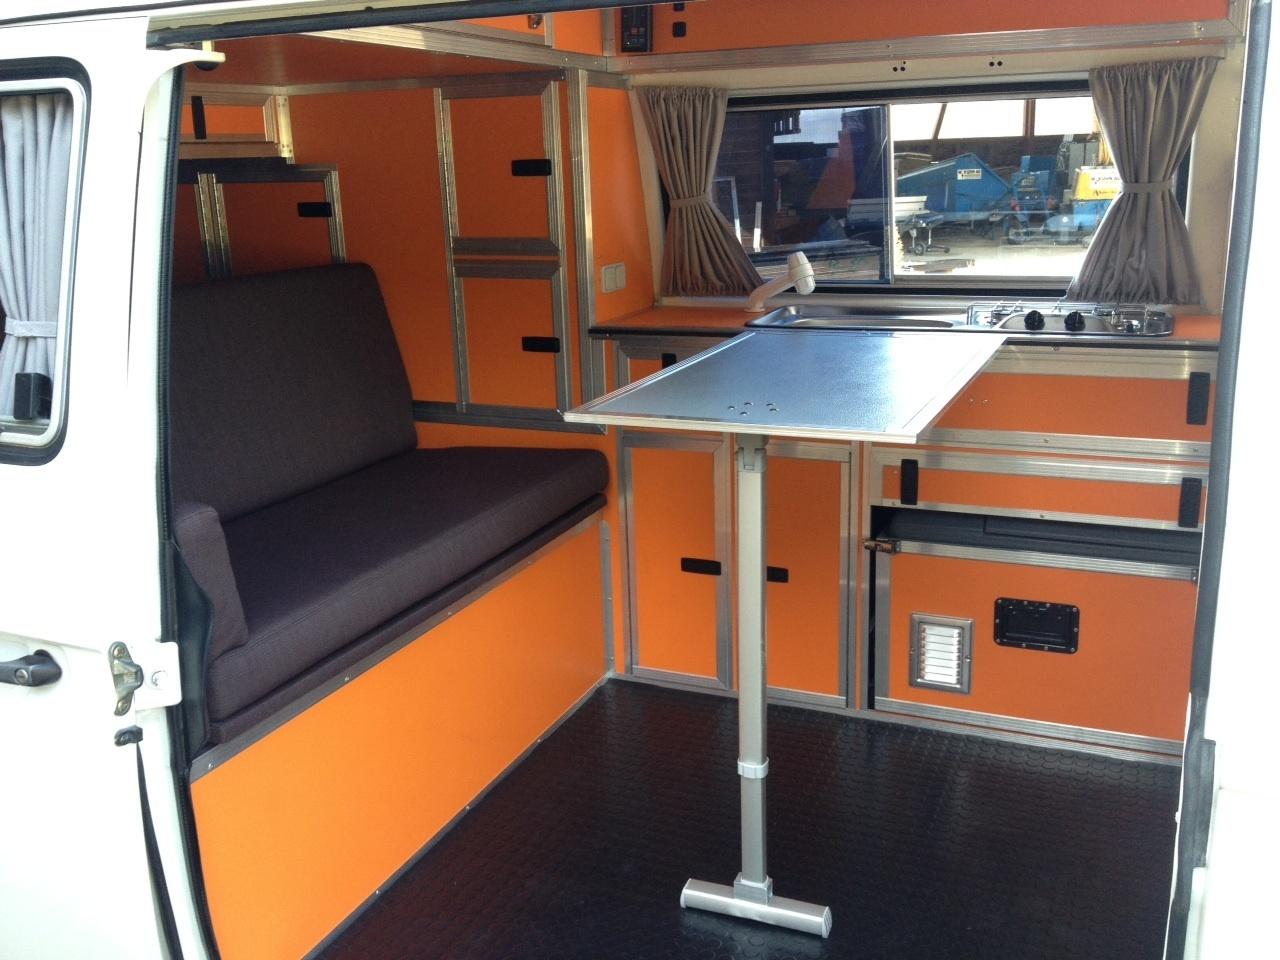 neuer innenausbau beim t3 cassandra camping vwbusforum ch. Black Bedroom Furniture Sets. Home Design Ideas